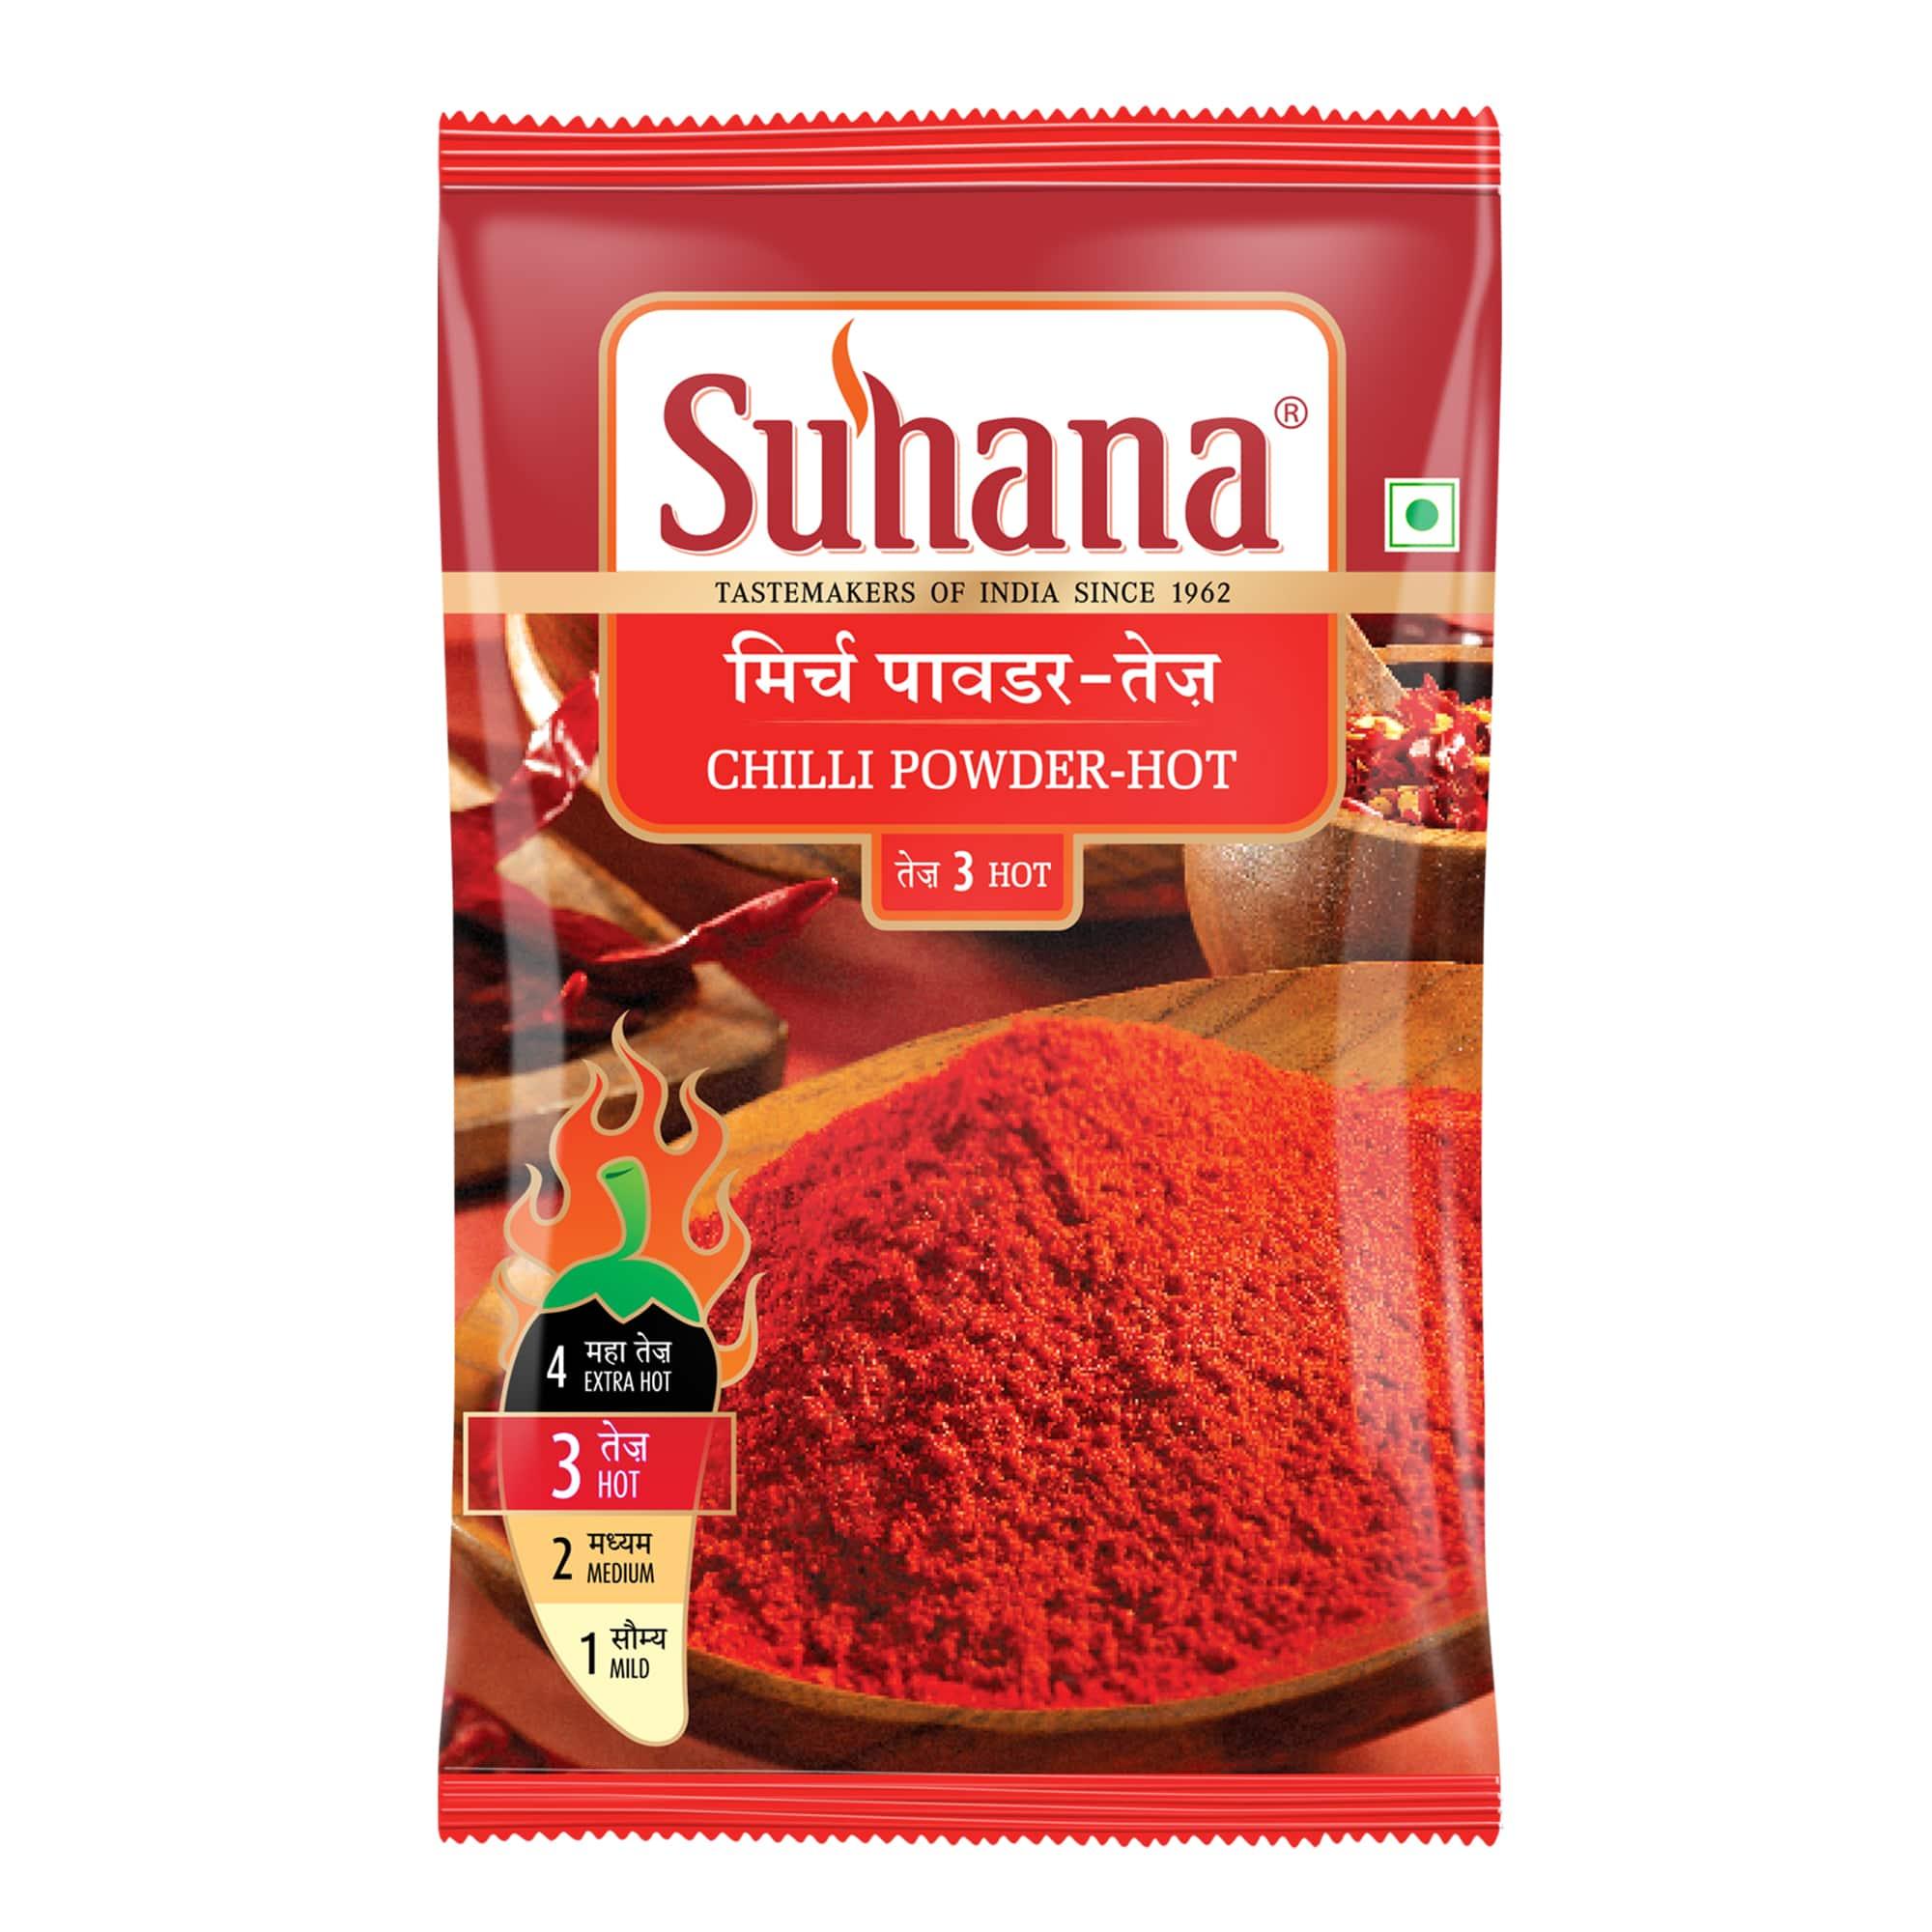 Suhana Hot Chilli Powder Pouch